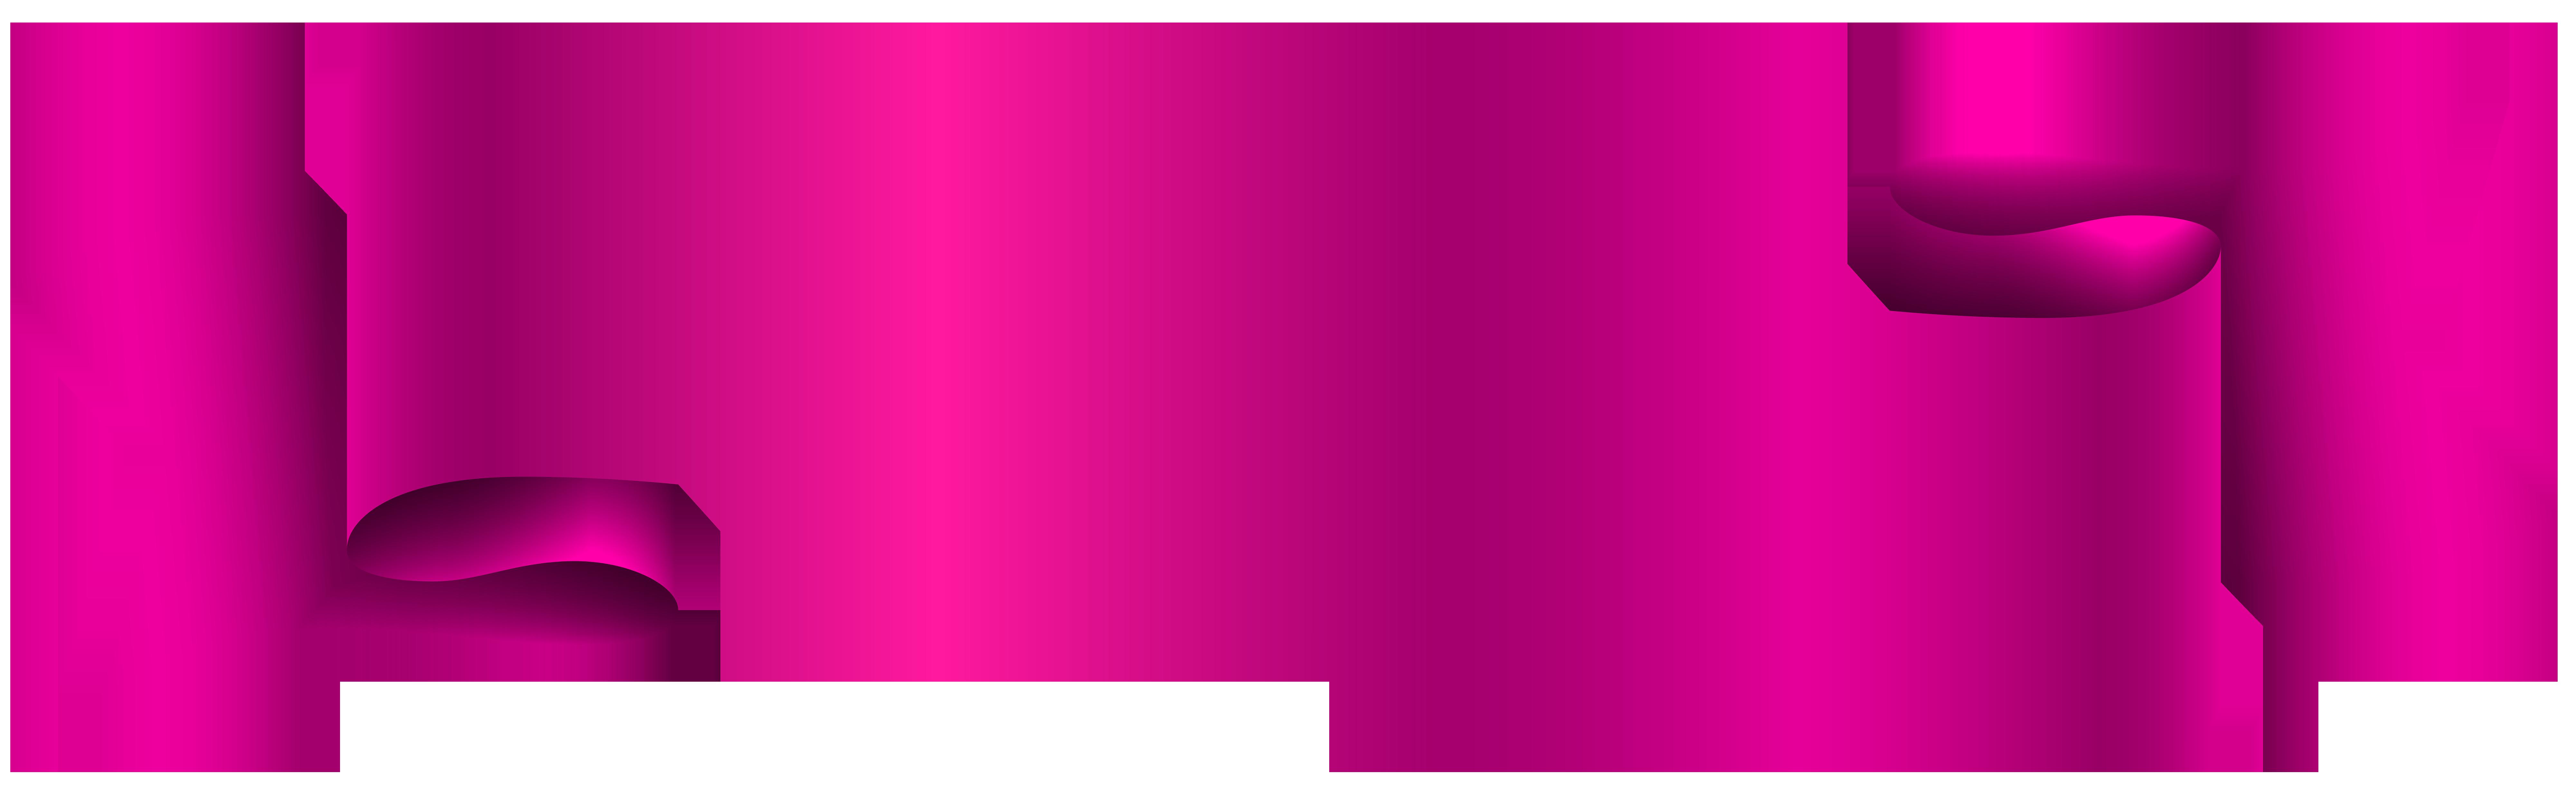 8000x2467 Pink Banner Transparent Png Clip Art Imageu200b Gallery Yopriceville